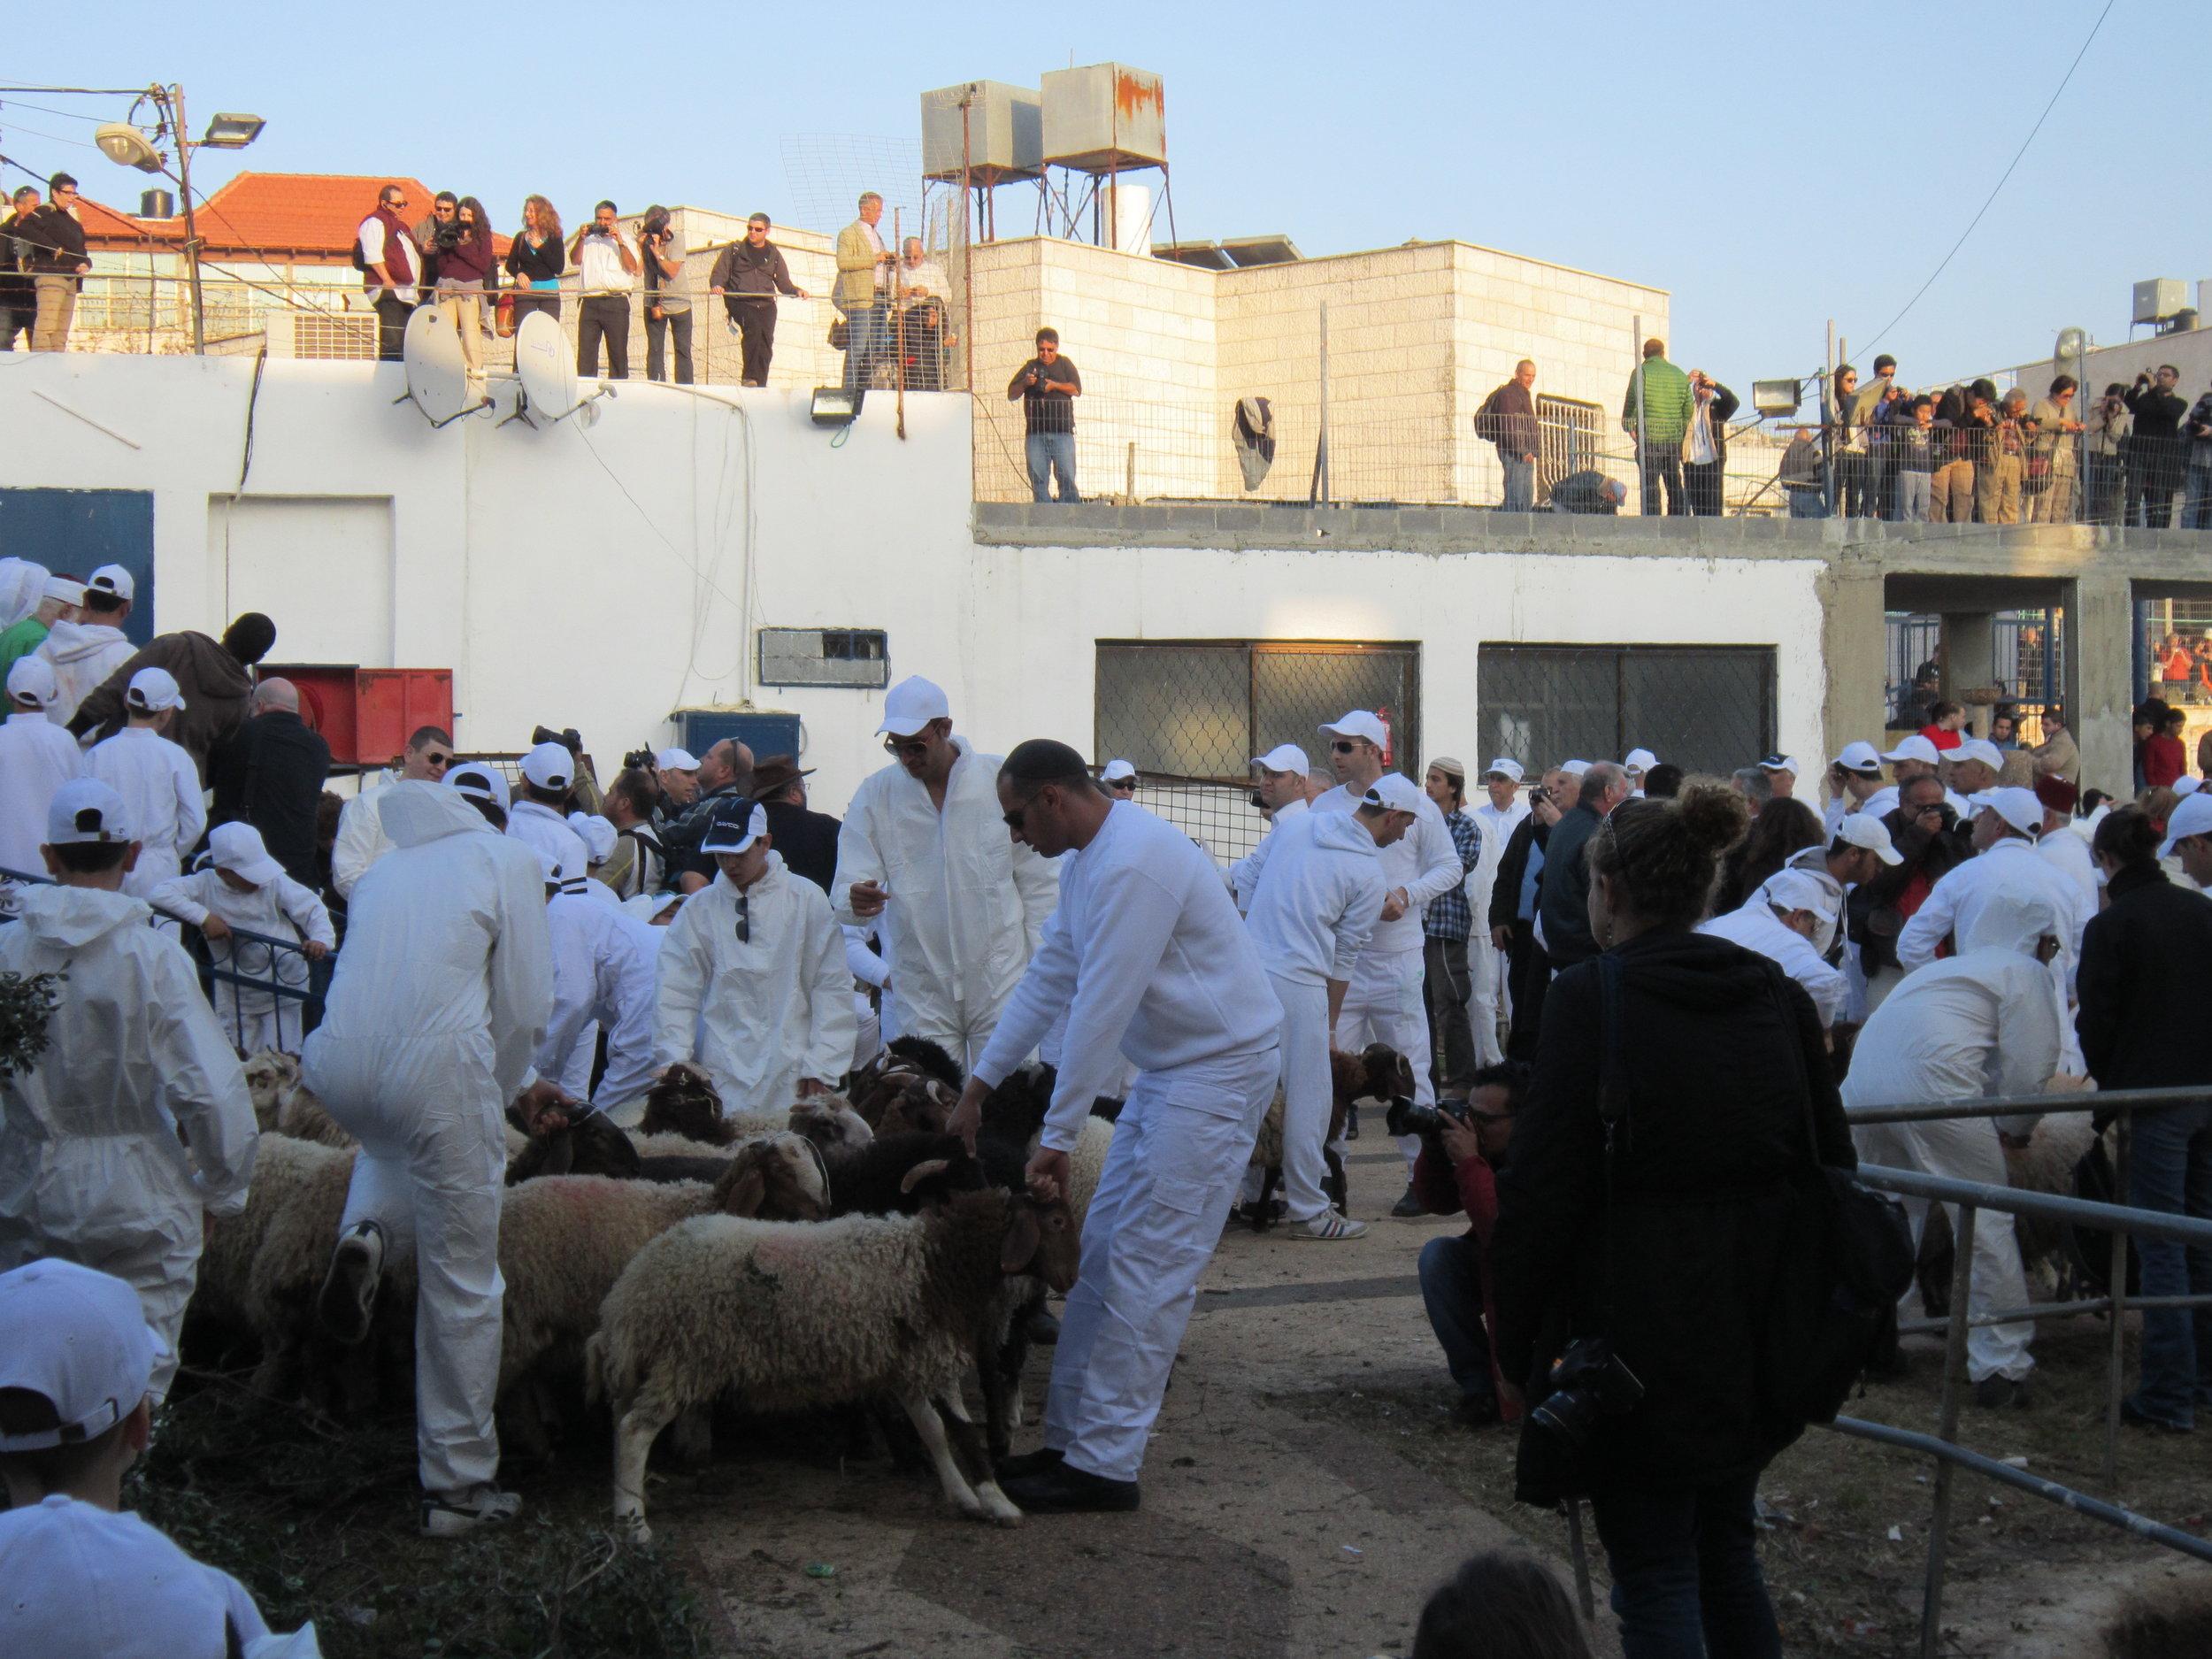 Preparation for sacrifice on Mt. Gerazim